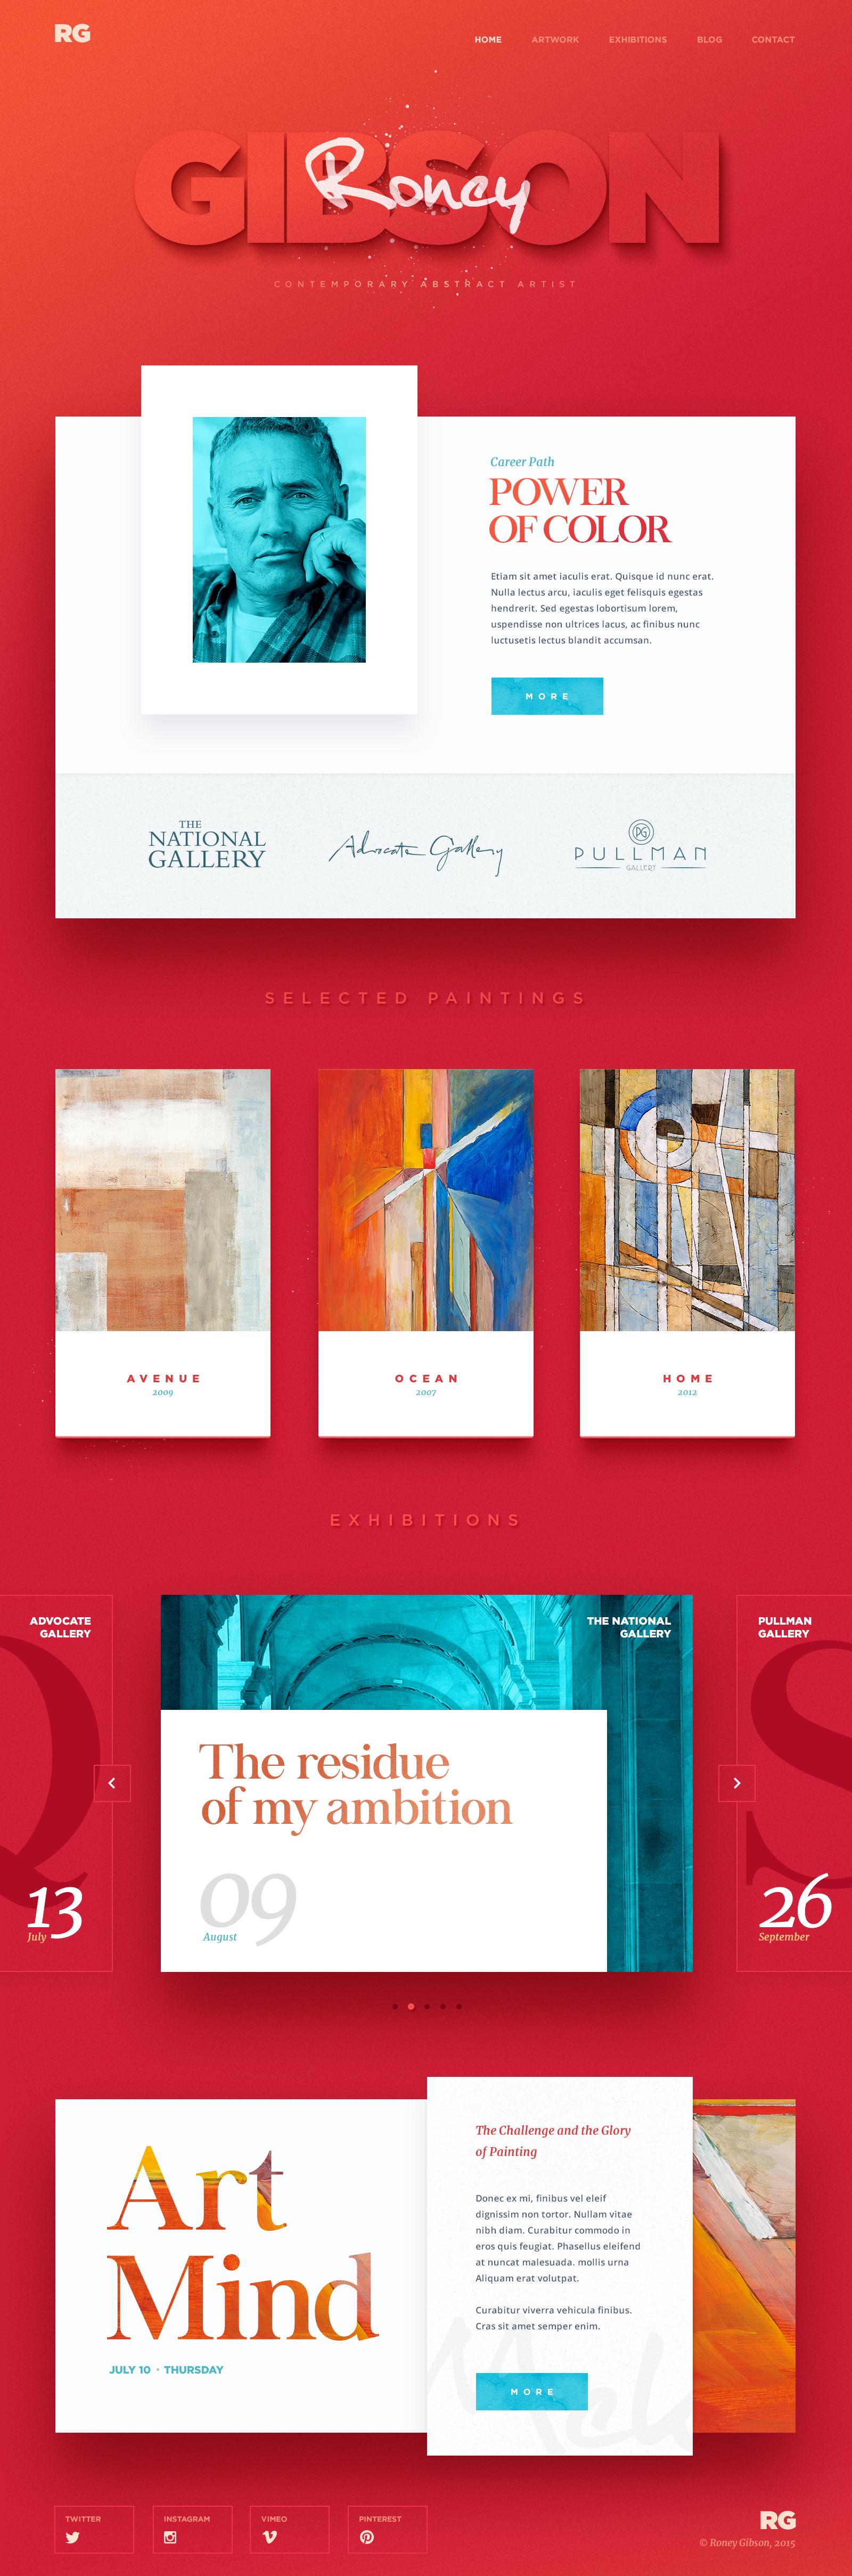 Web site design art